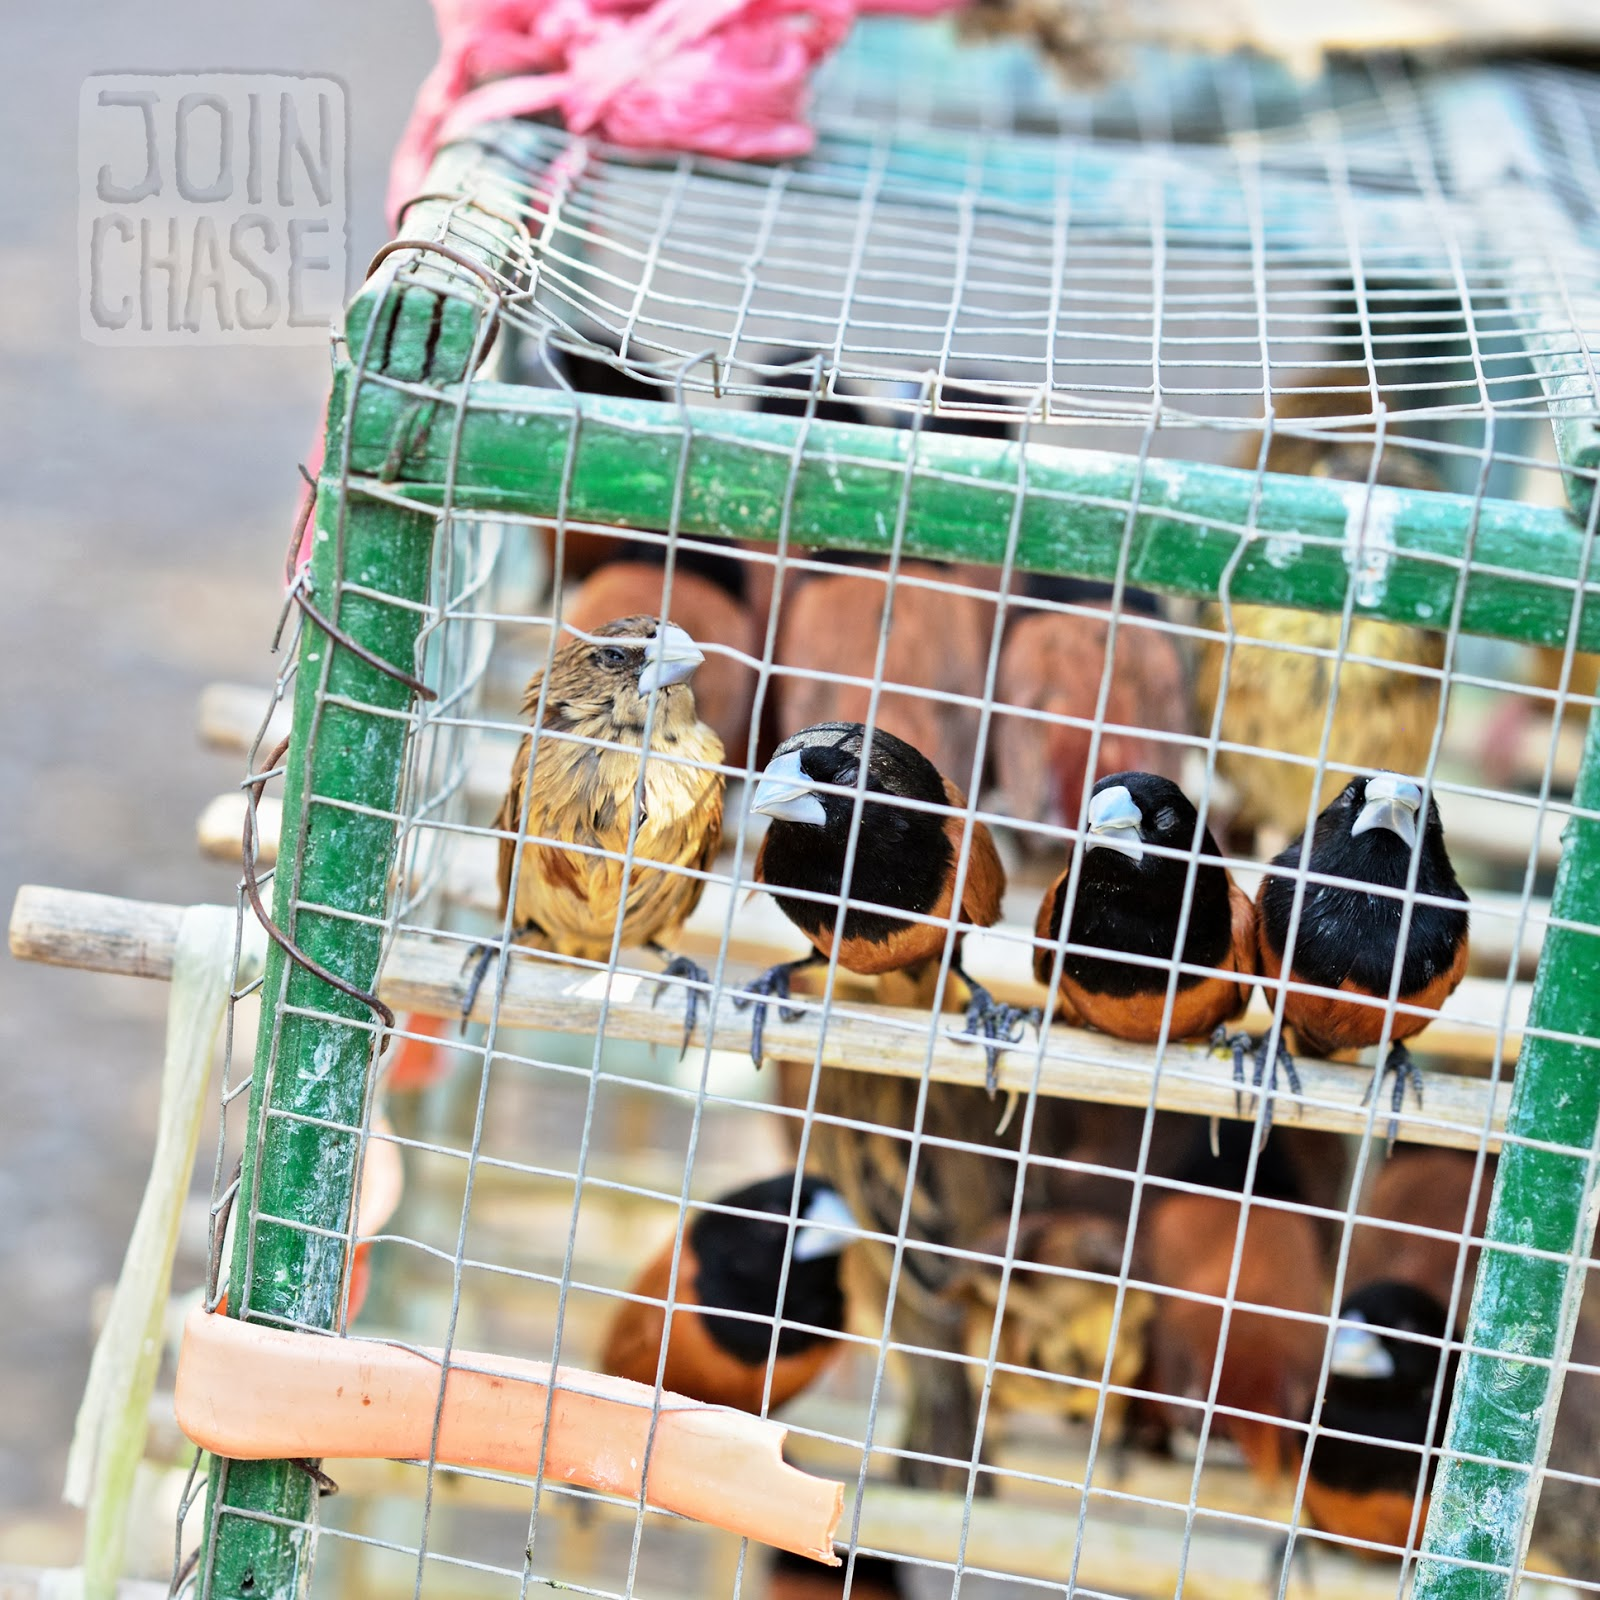 Birds in a cage in Yangon, Myanmar.